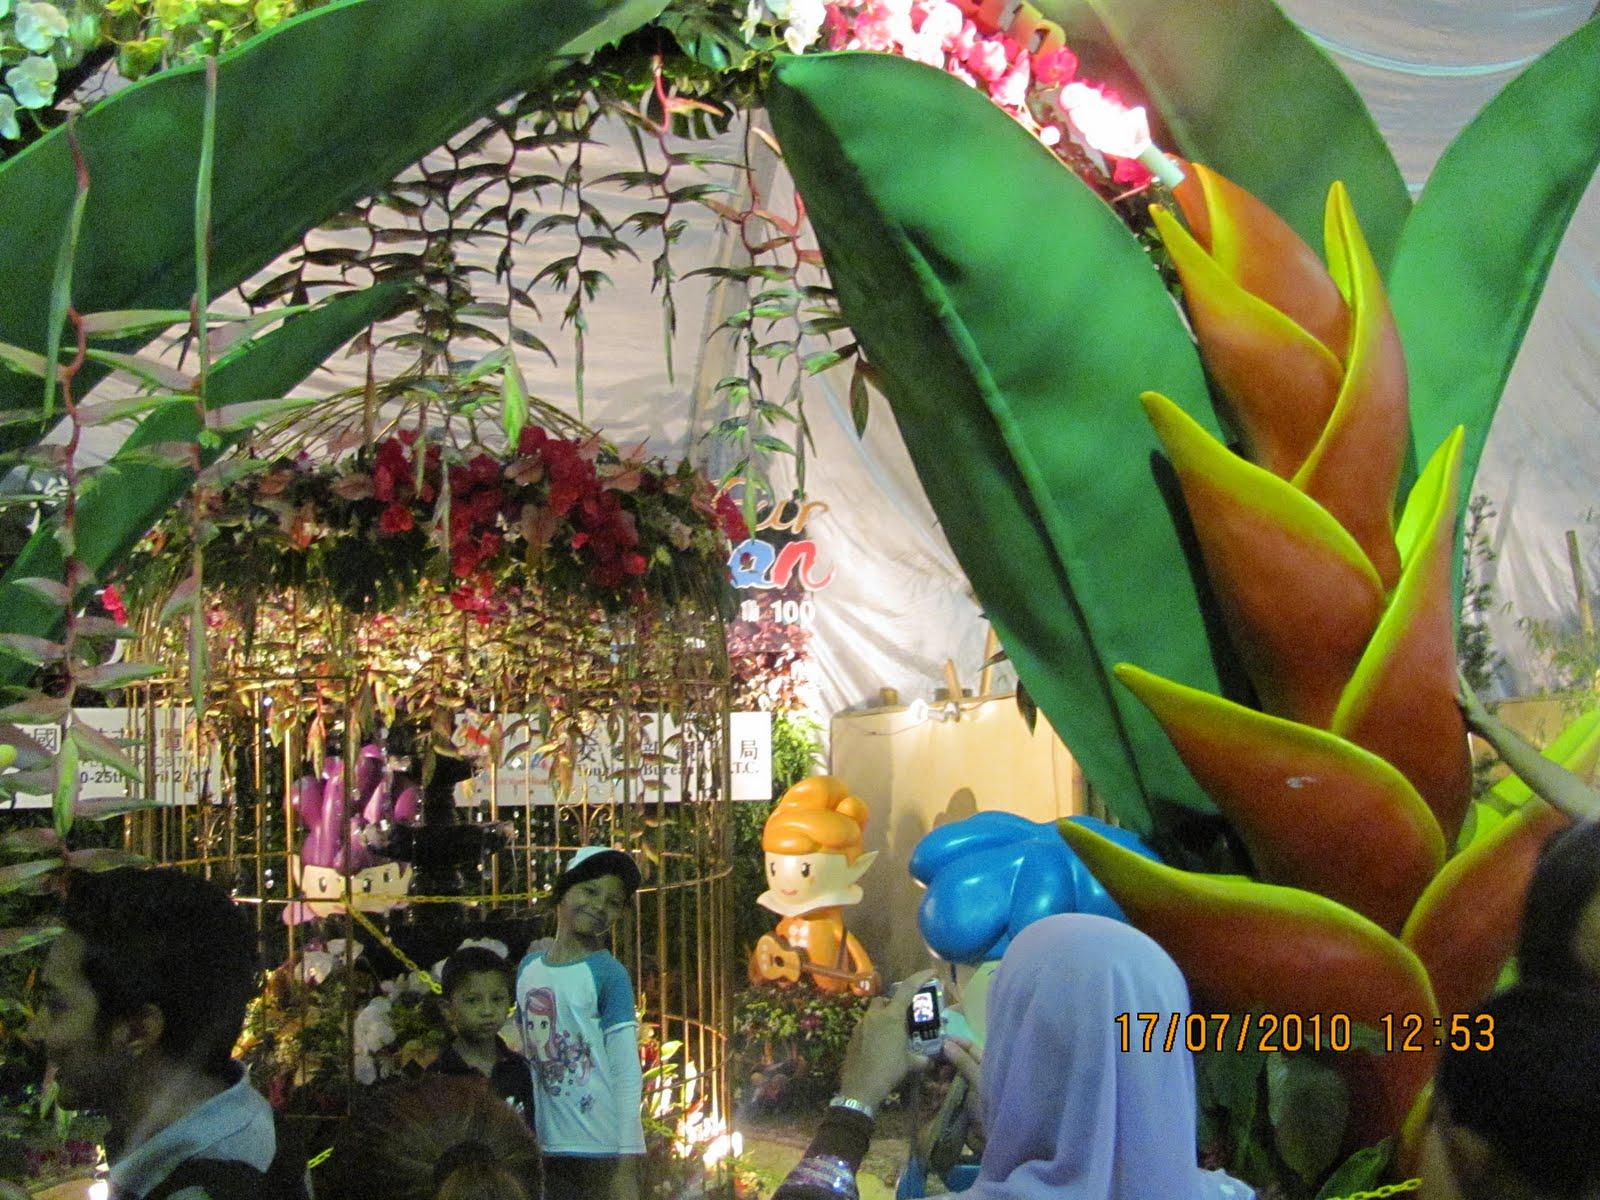 Putrajaya Flora Fest 2010 - Indoor (Part 3) | Whatever I see, hear ...